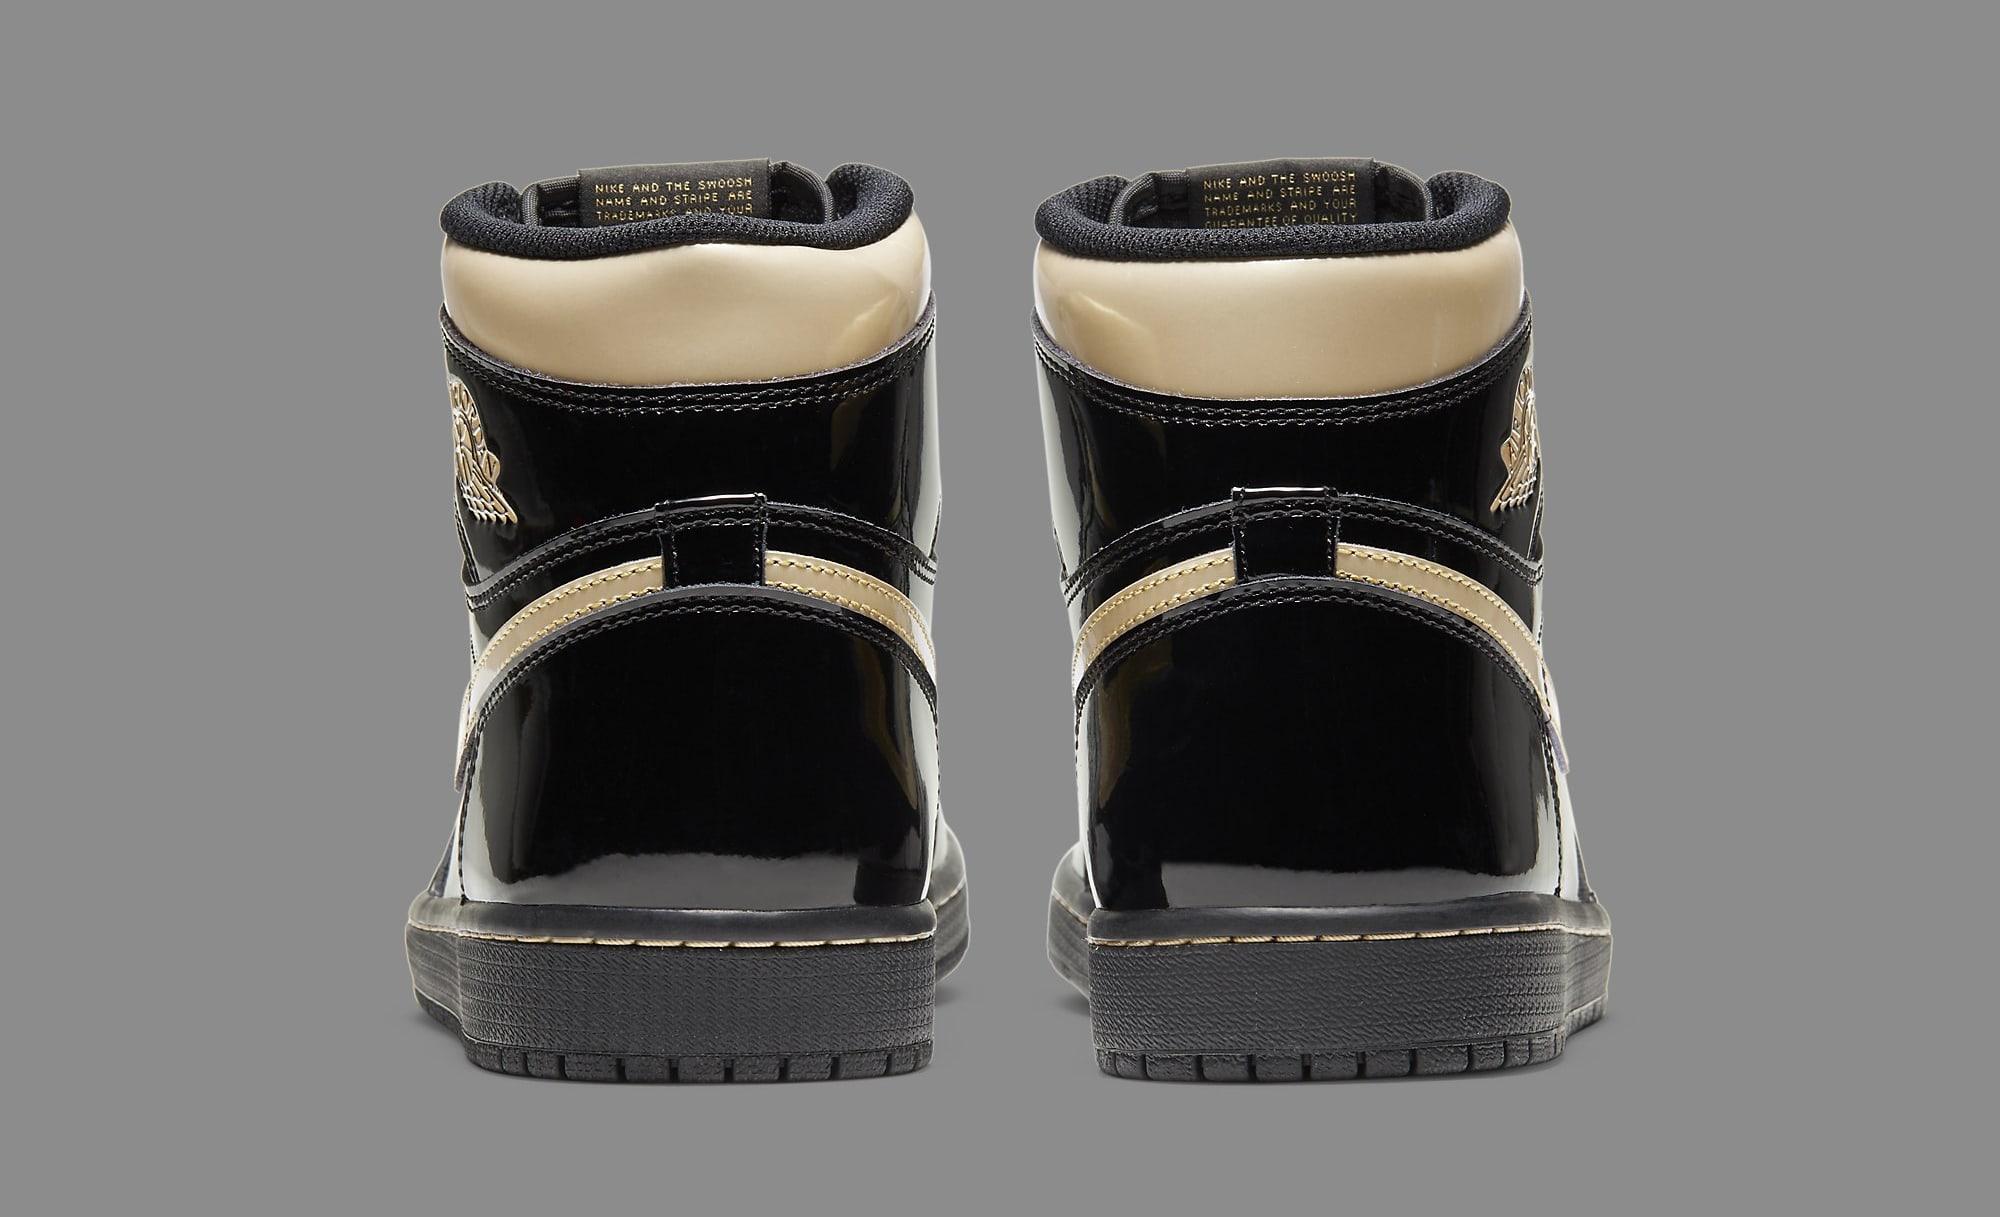 Air Jordan 1 Retro High OG 'Metallic Gold' 555088-032 Heel